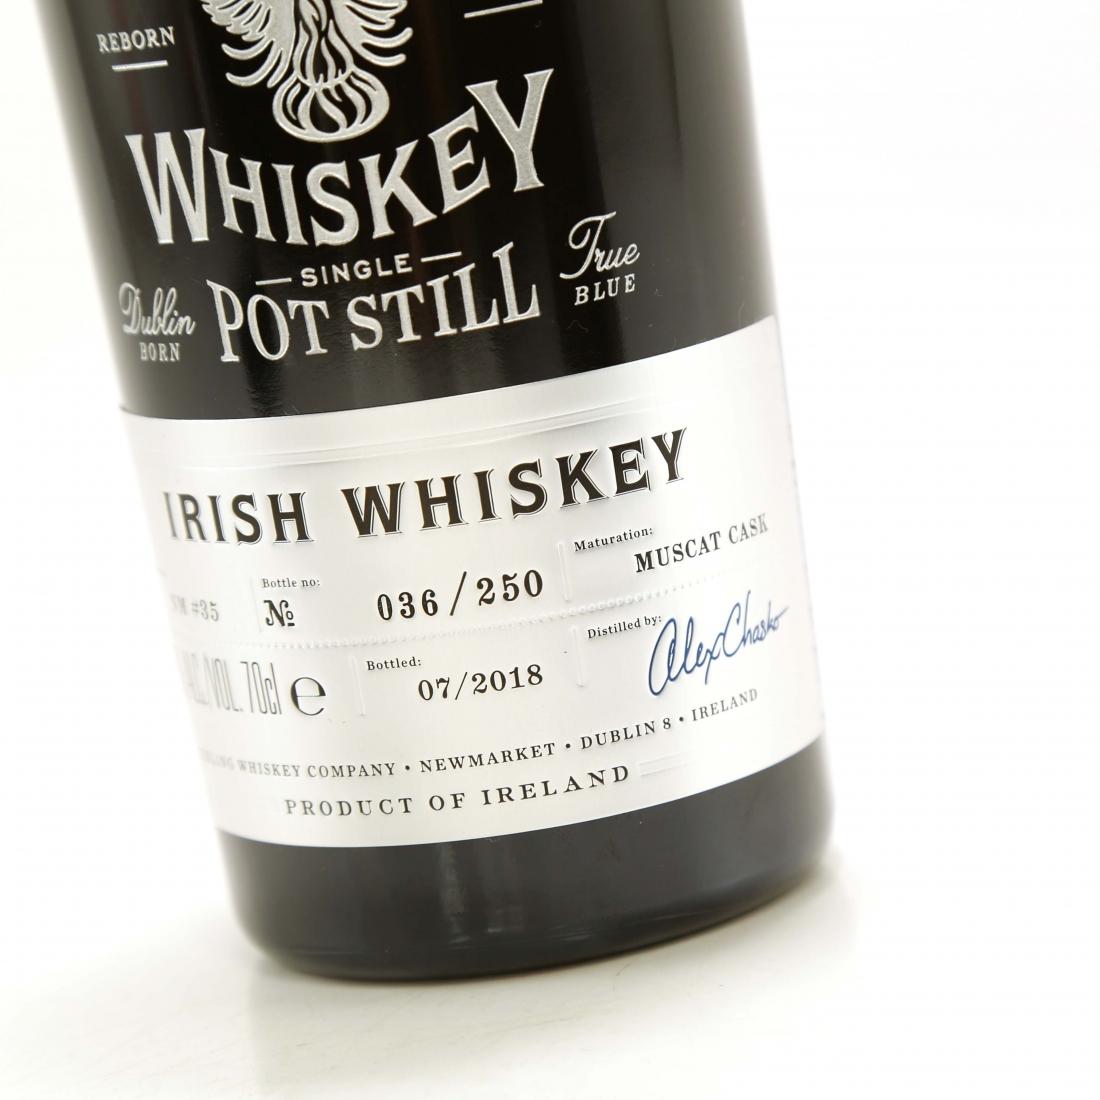 Teeling Celebratory Single Pot Still Whiskey / Bottle #036